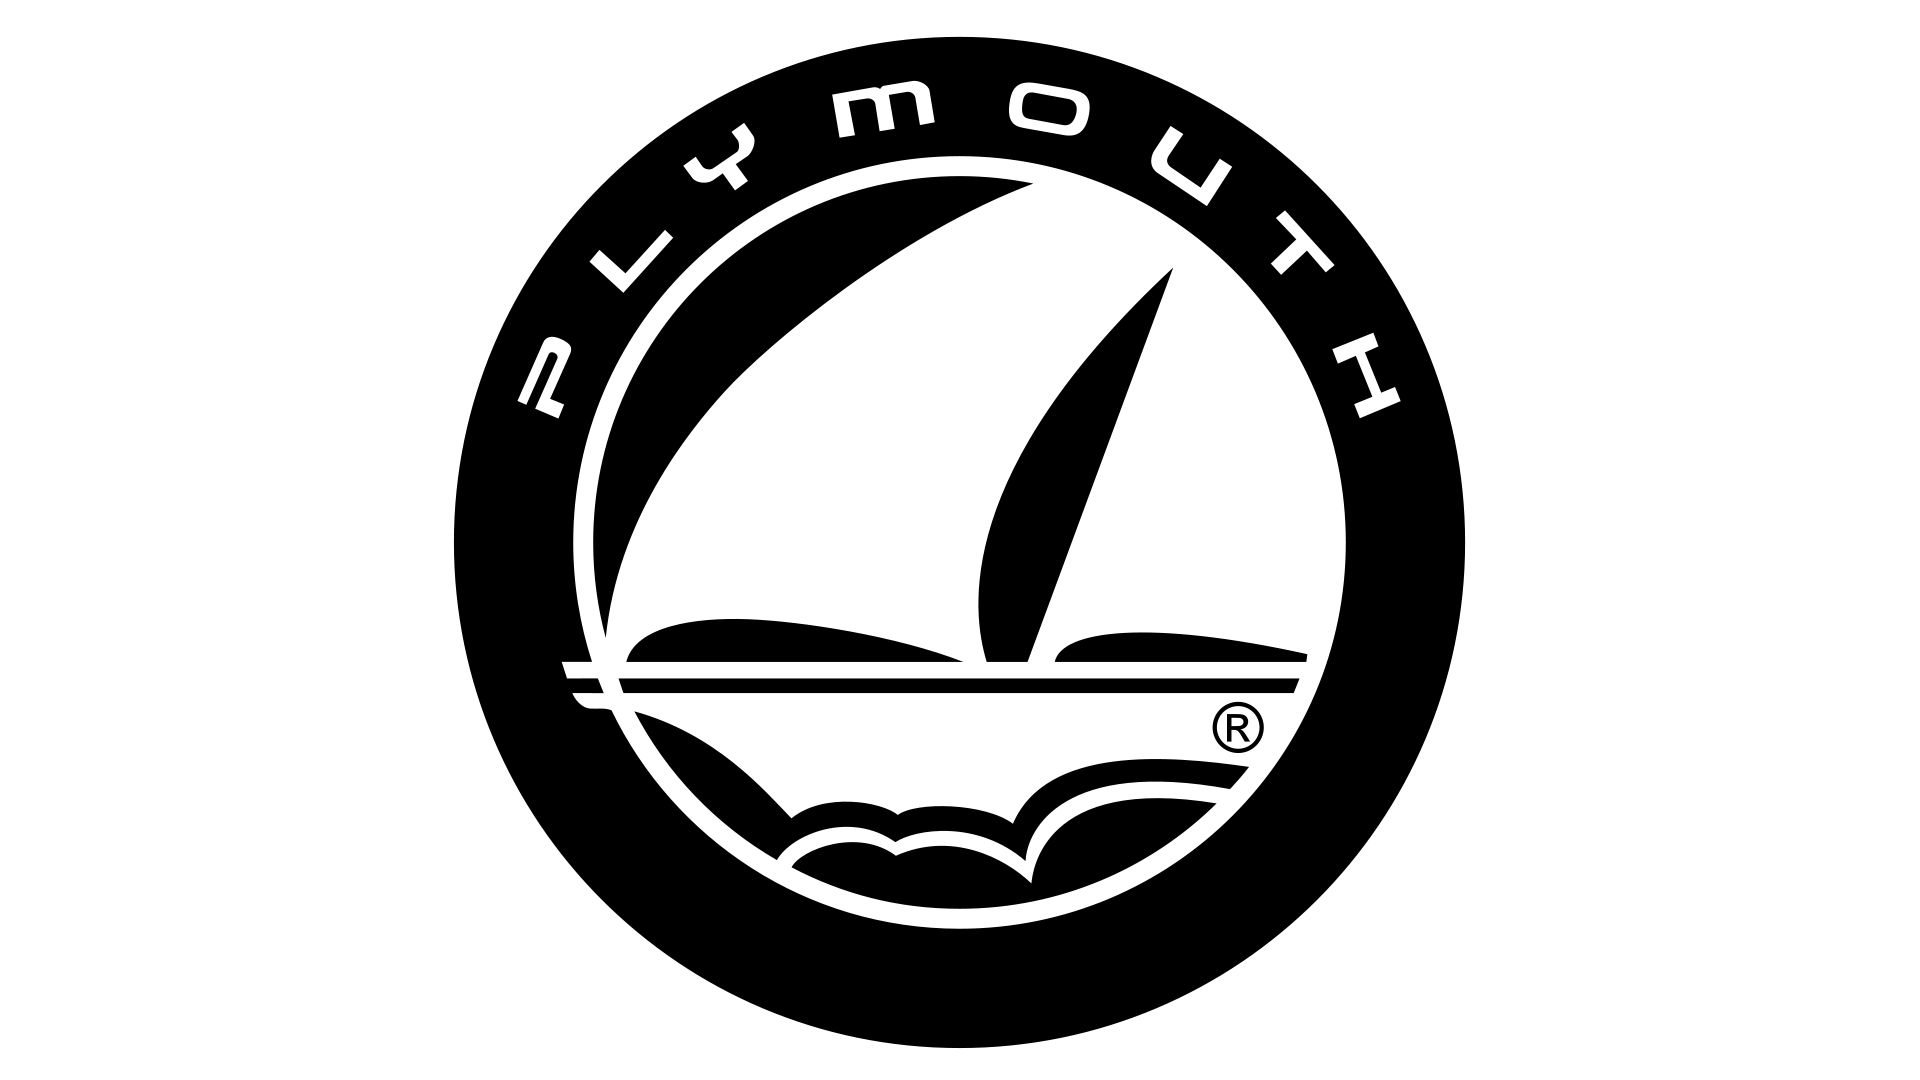 Pubg Hd Png Logo: Plymouth Logo, HD Png, Information